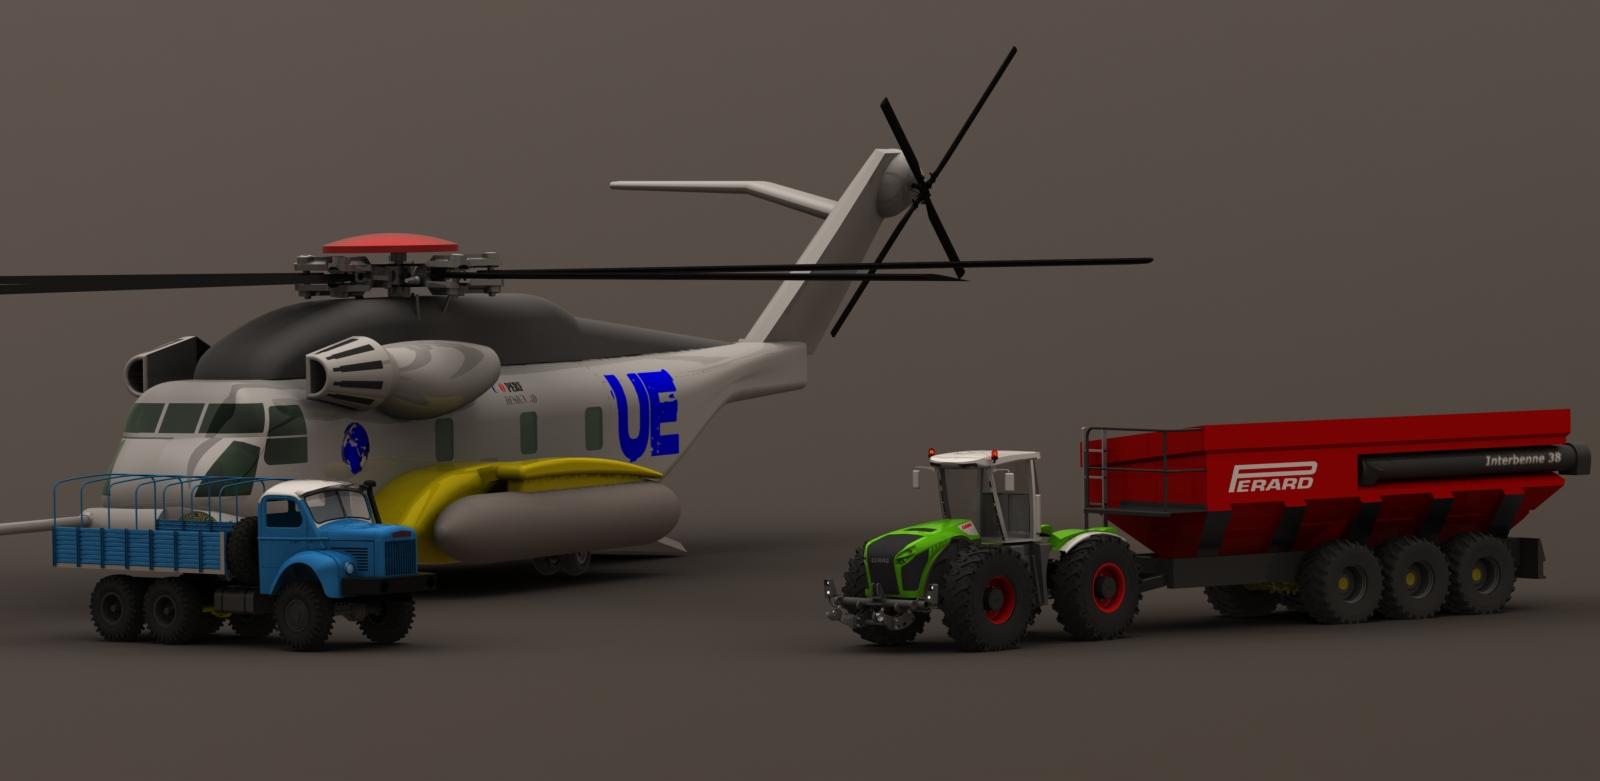 construction XERION echelle 1/8em R/C - Page 4 Sikorsky.10